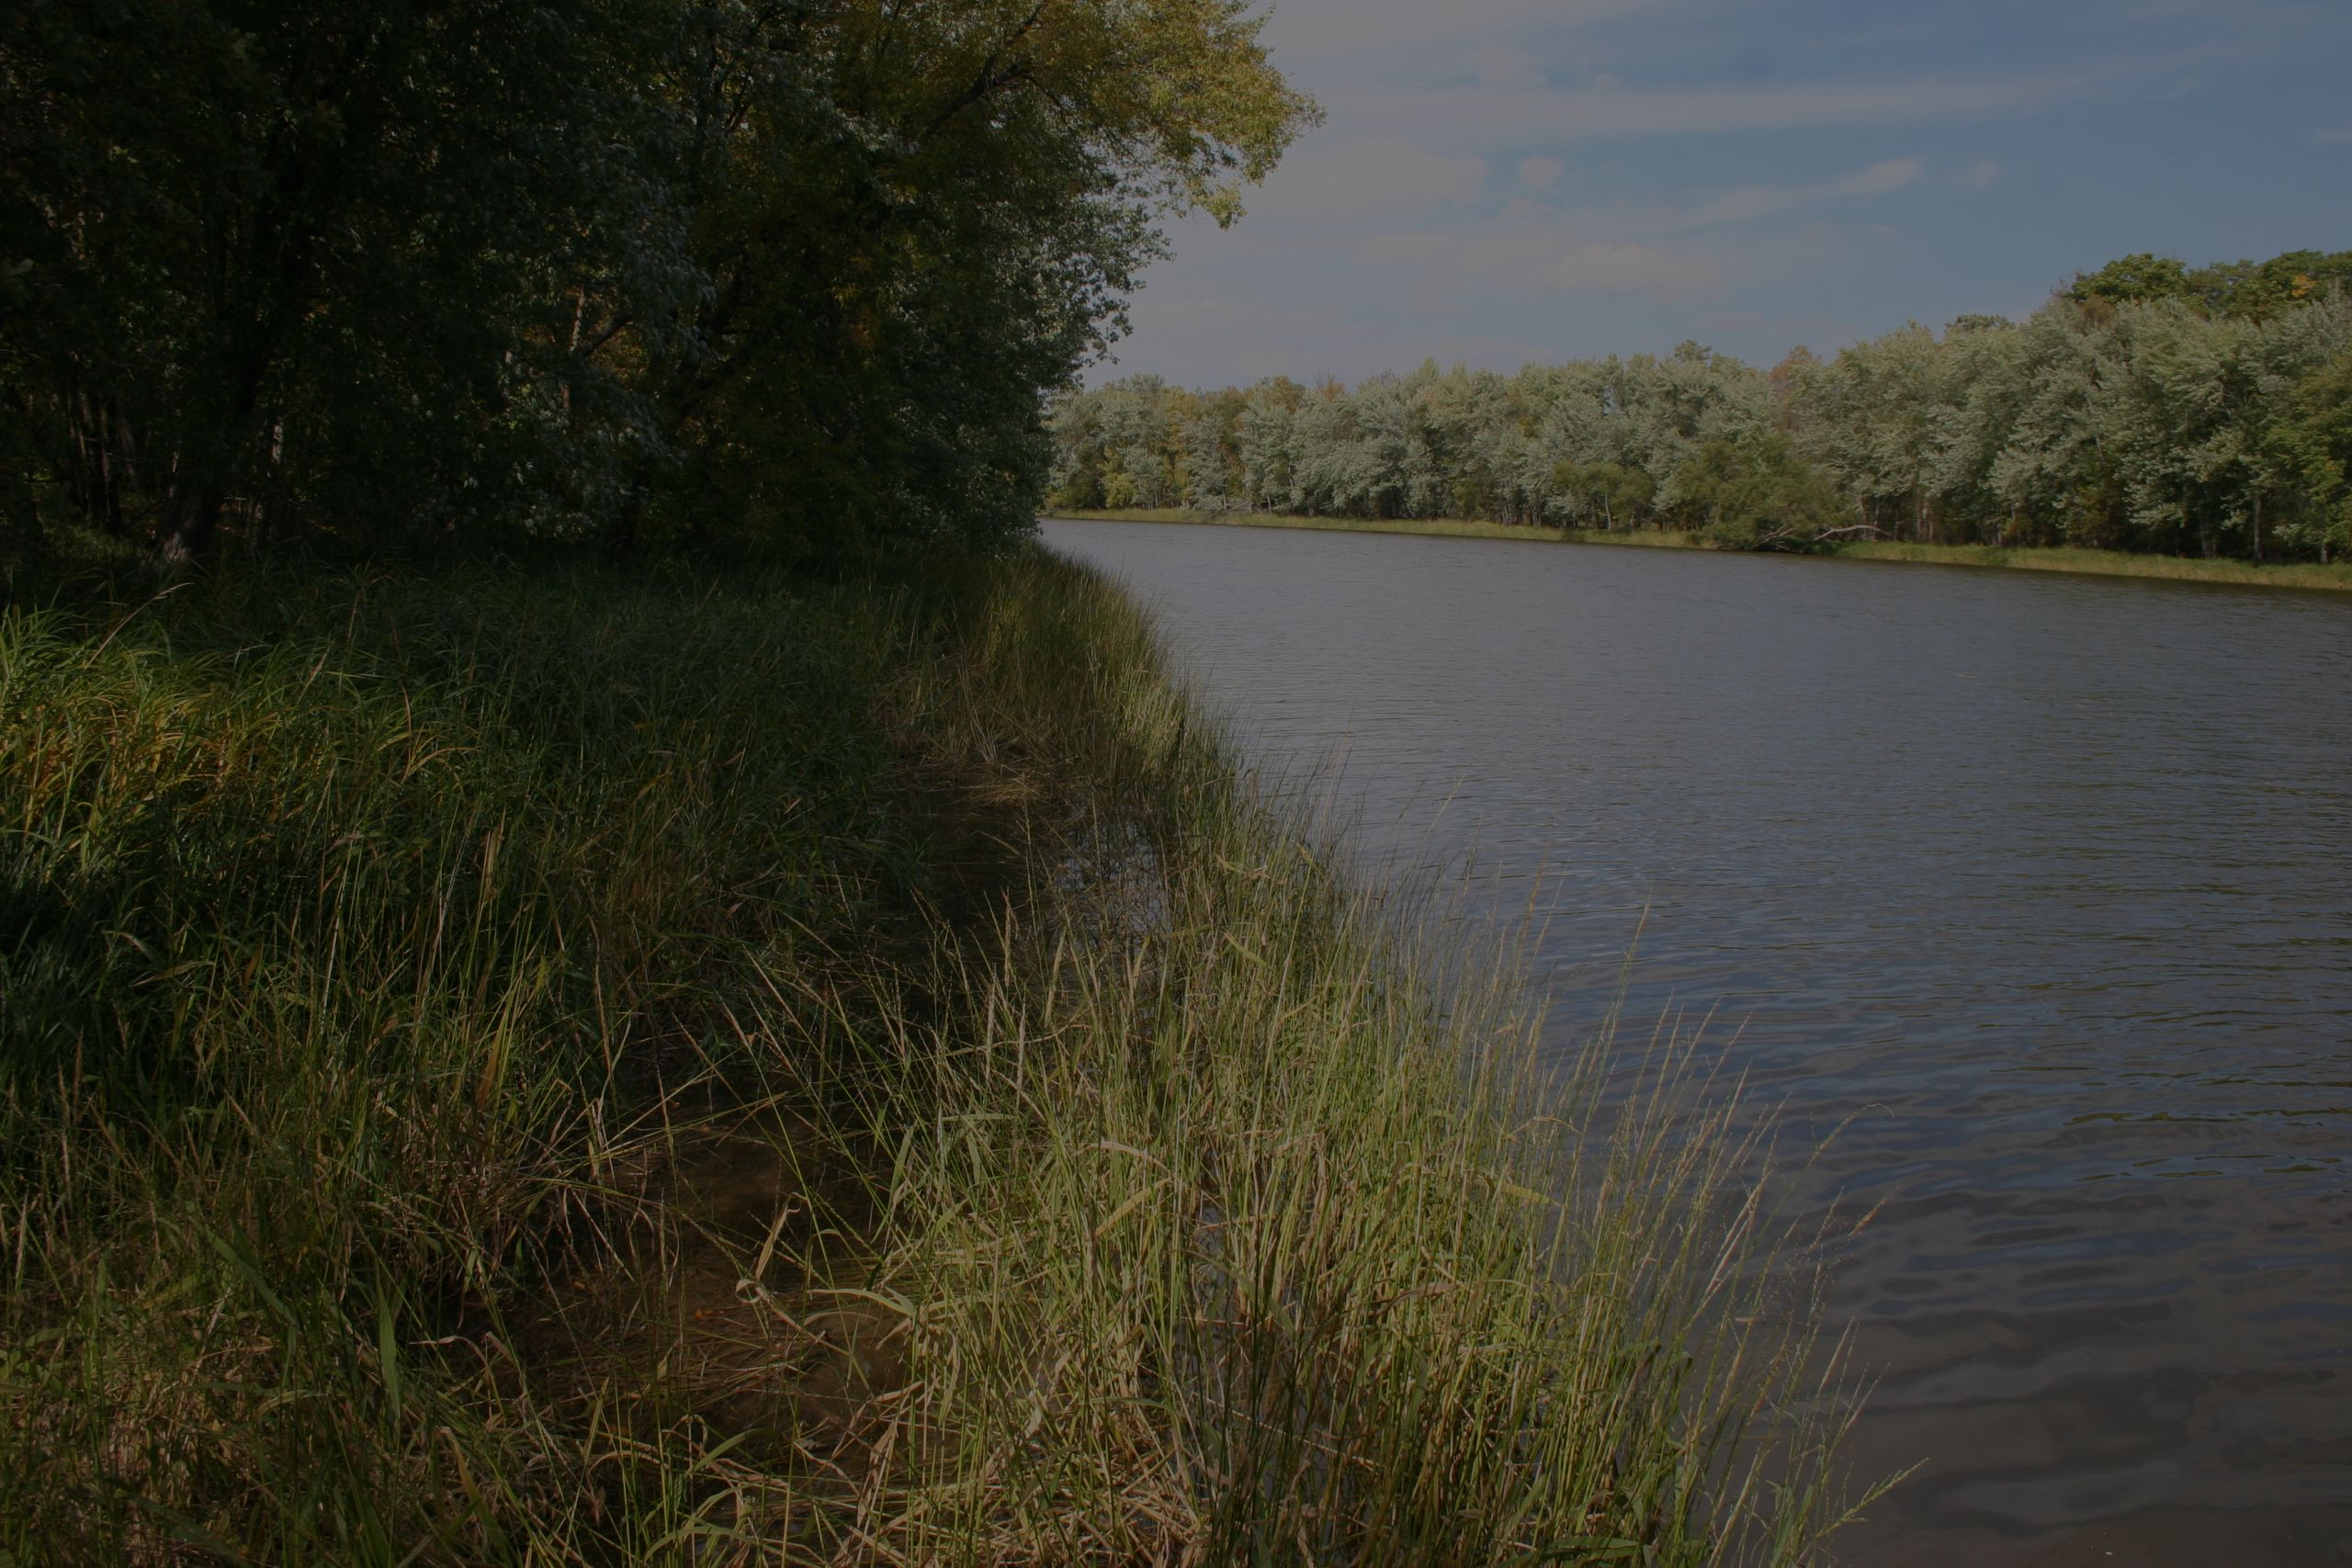 Enjoy the striking lake or river side views